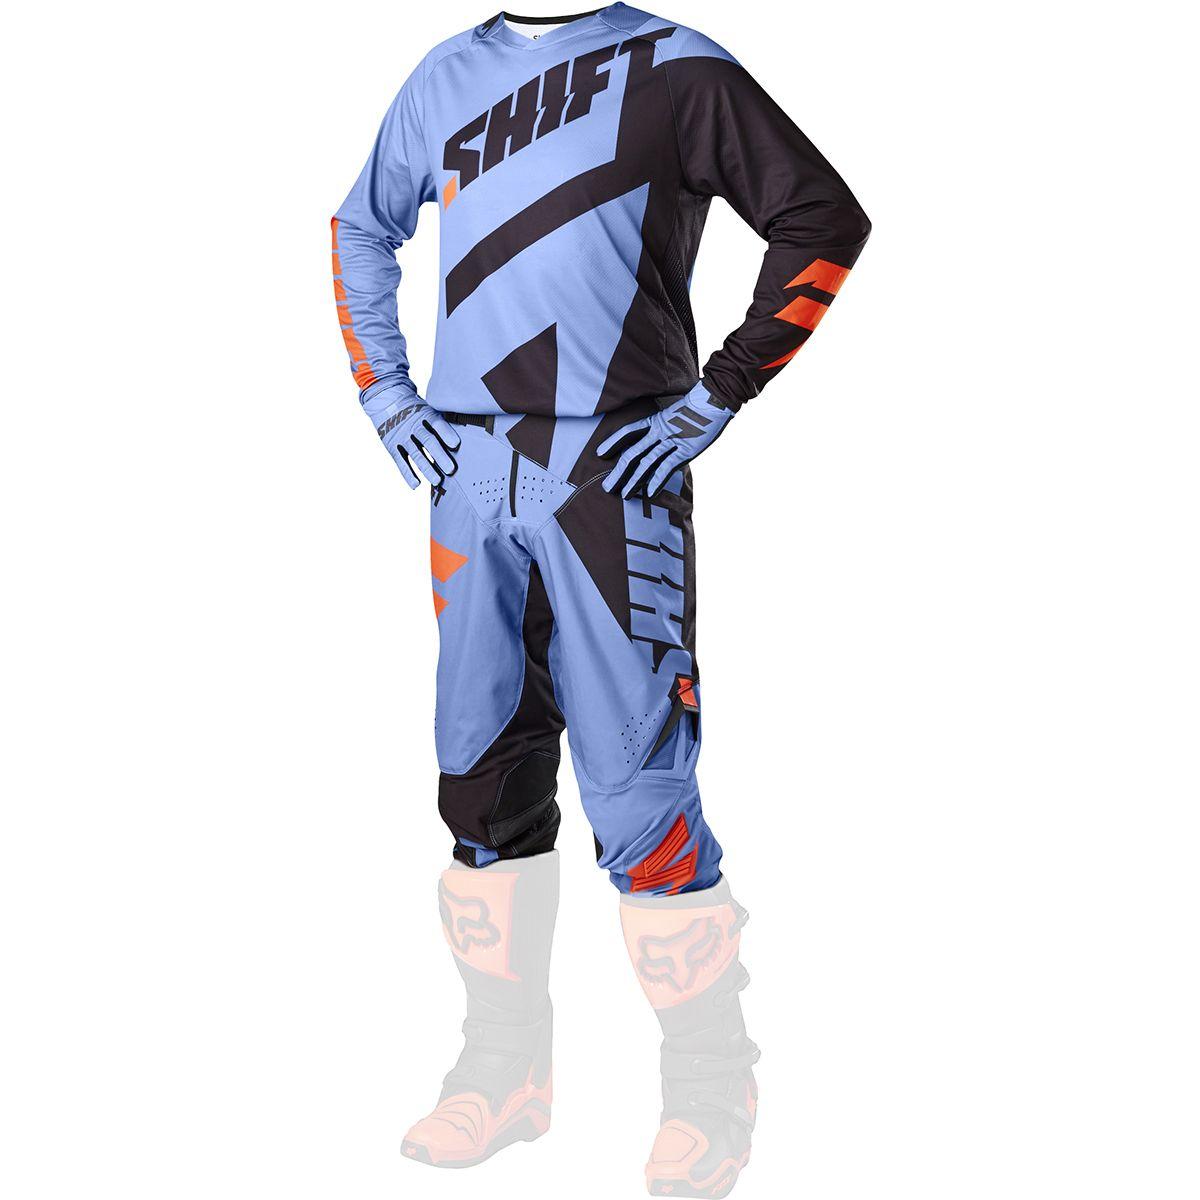 Shift - 2017 3LACK Mainline комплект штаны и джерси, синие